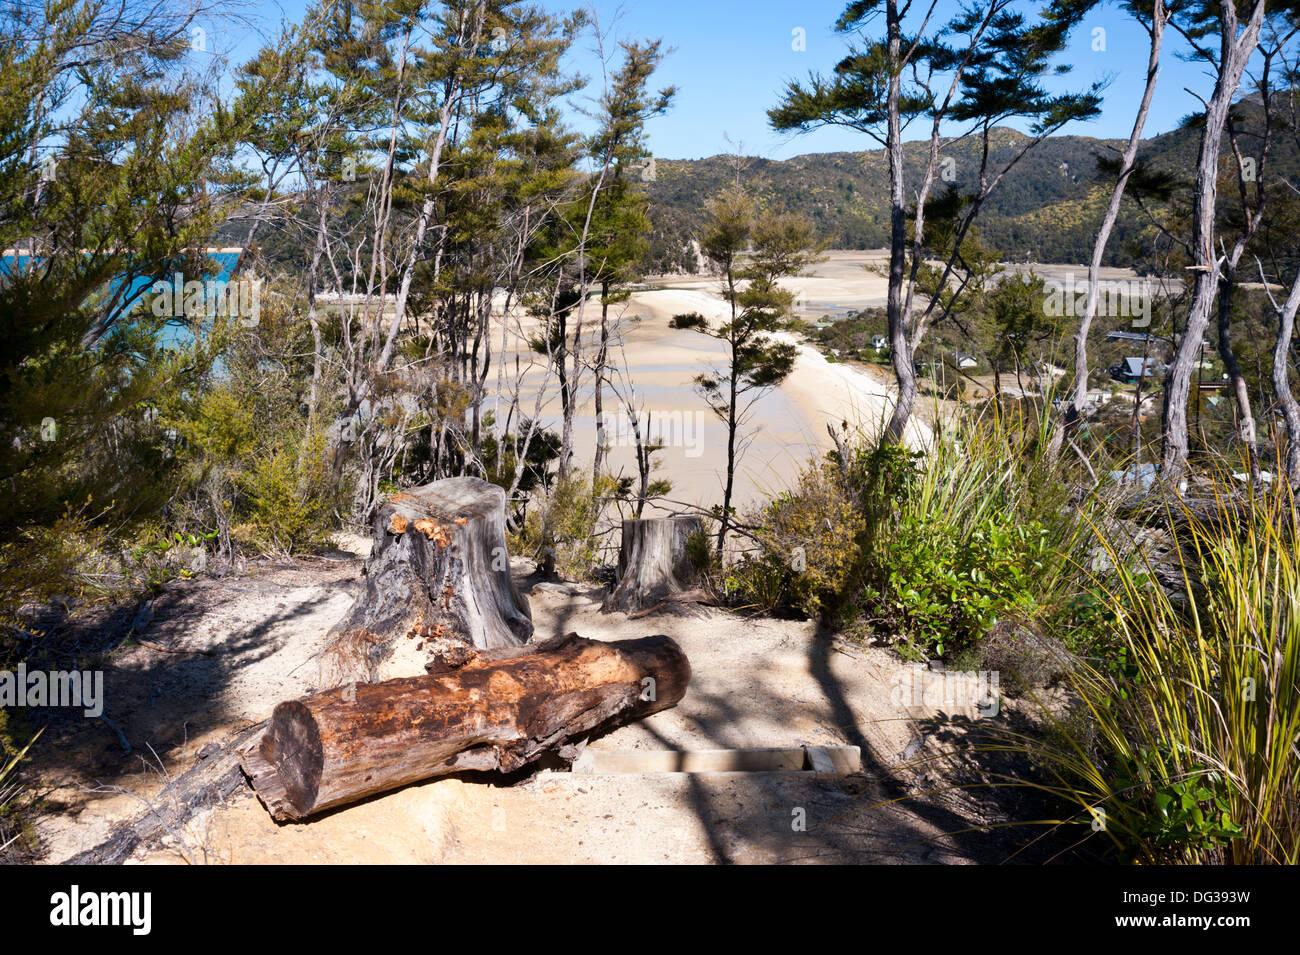 Abel Tasman National Park, New Zealand. The Abel Tasman Coastal Track at Torrent Bay. - Stock Image